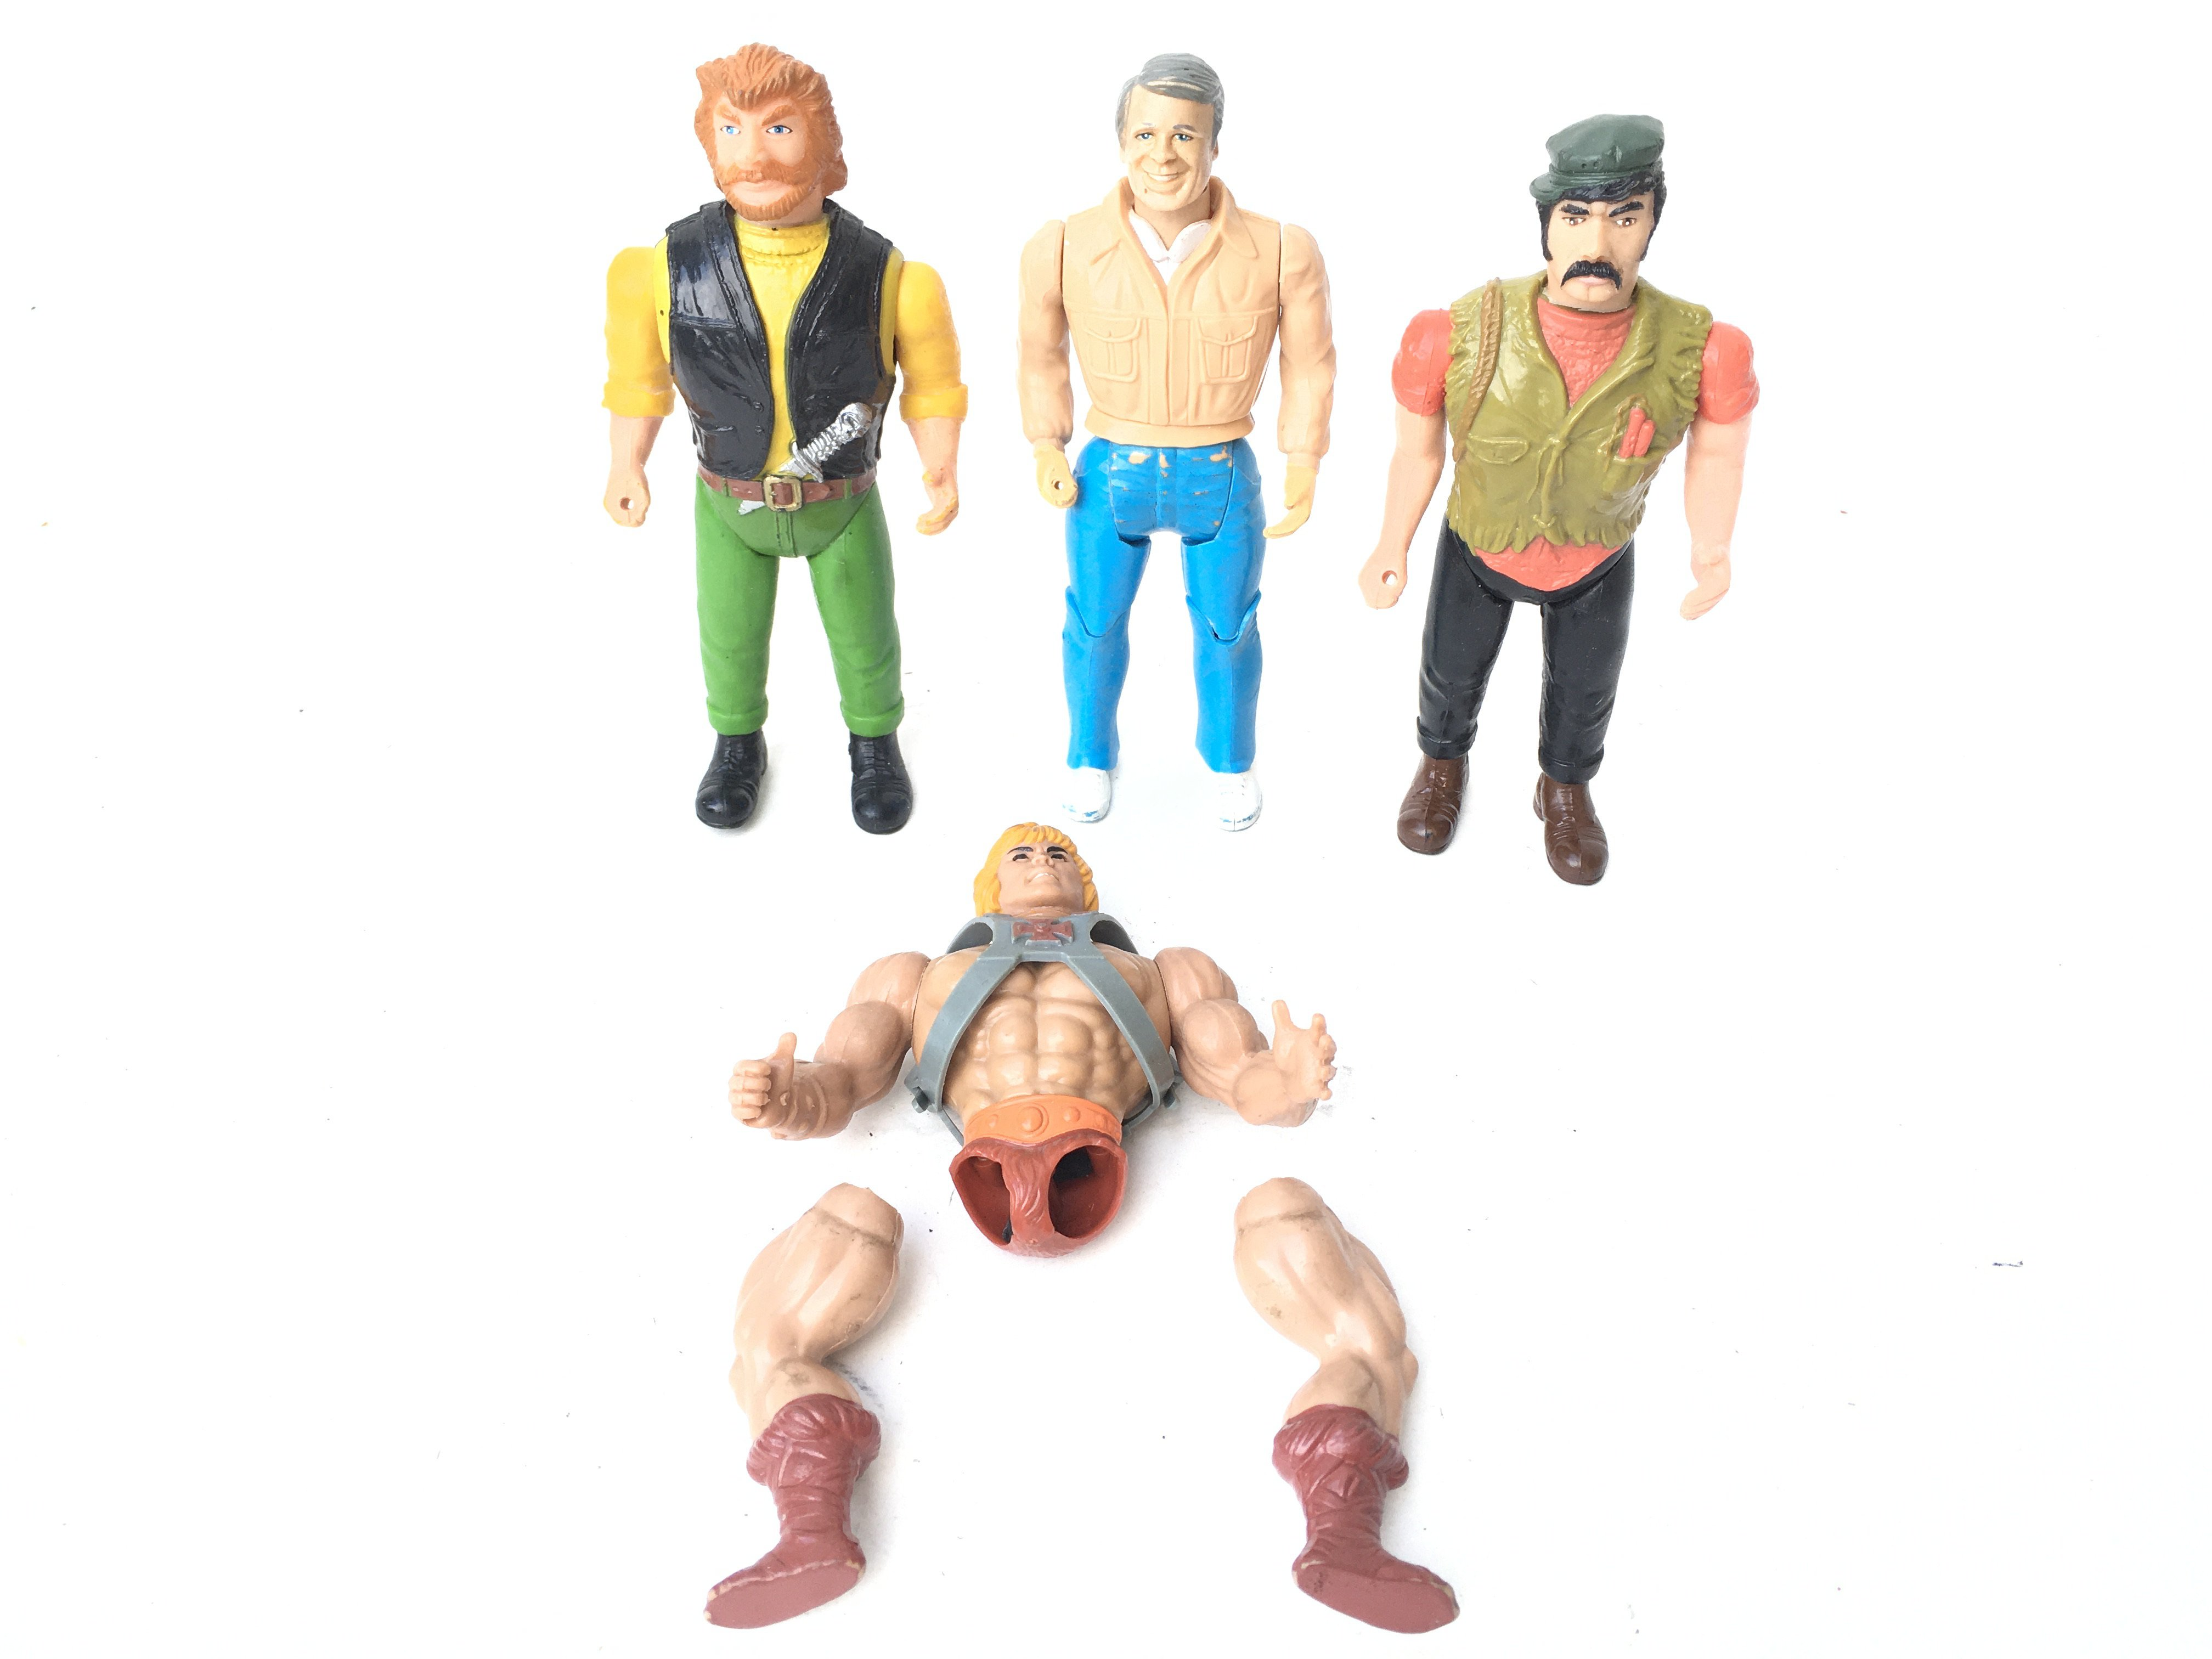 3 X The A-Team Figures and a Broken He-Man Figure.